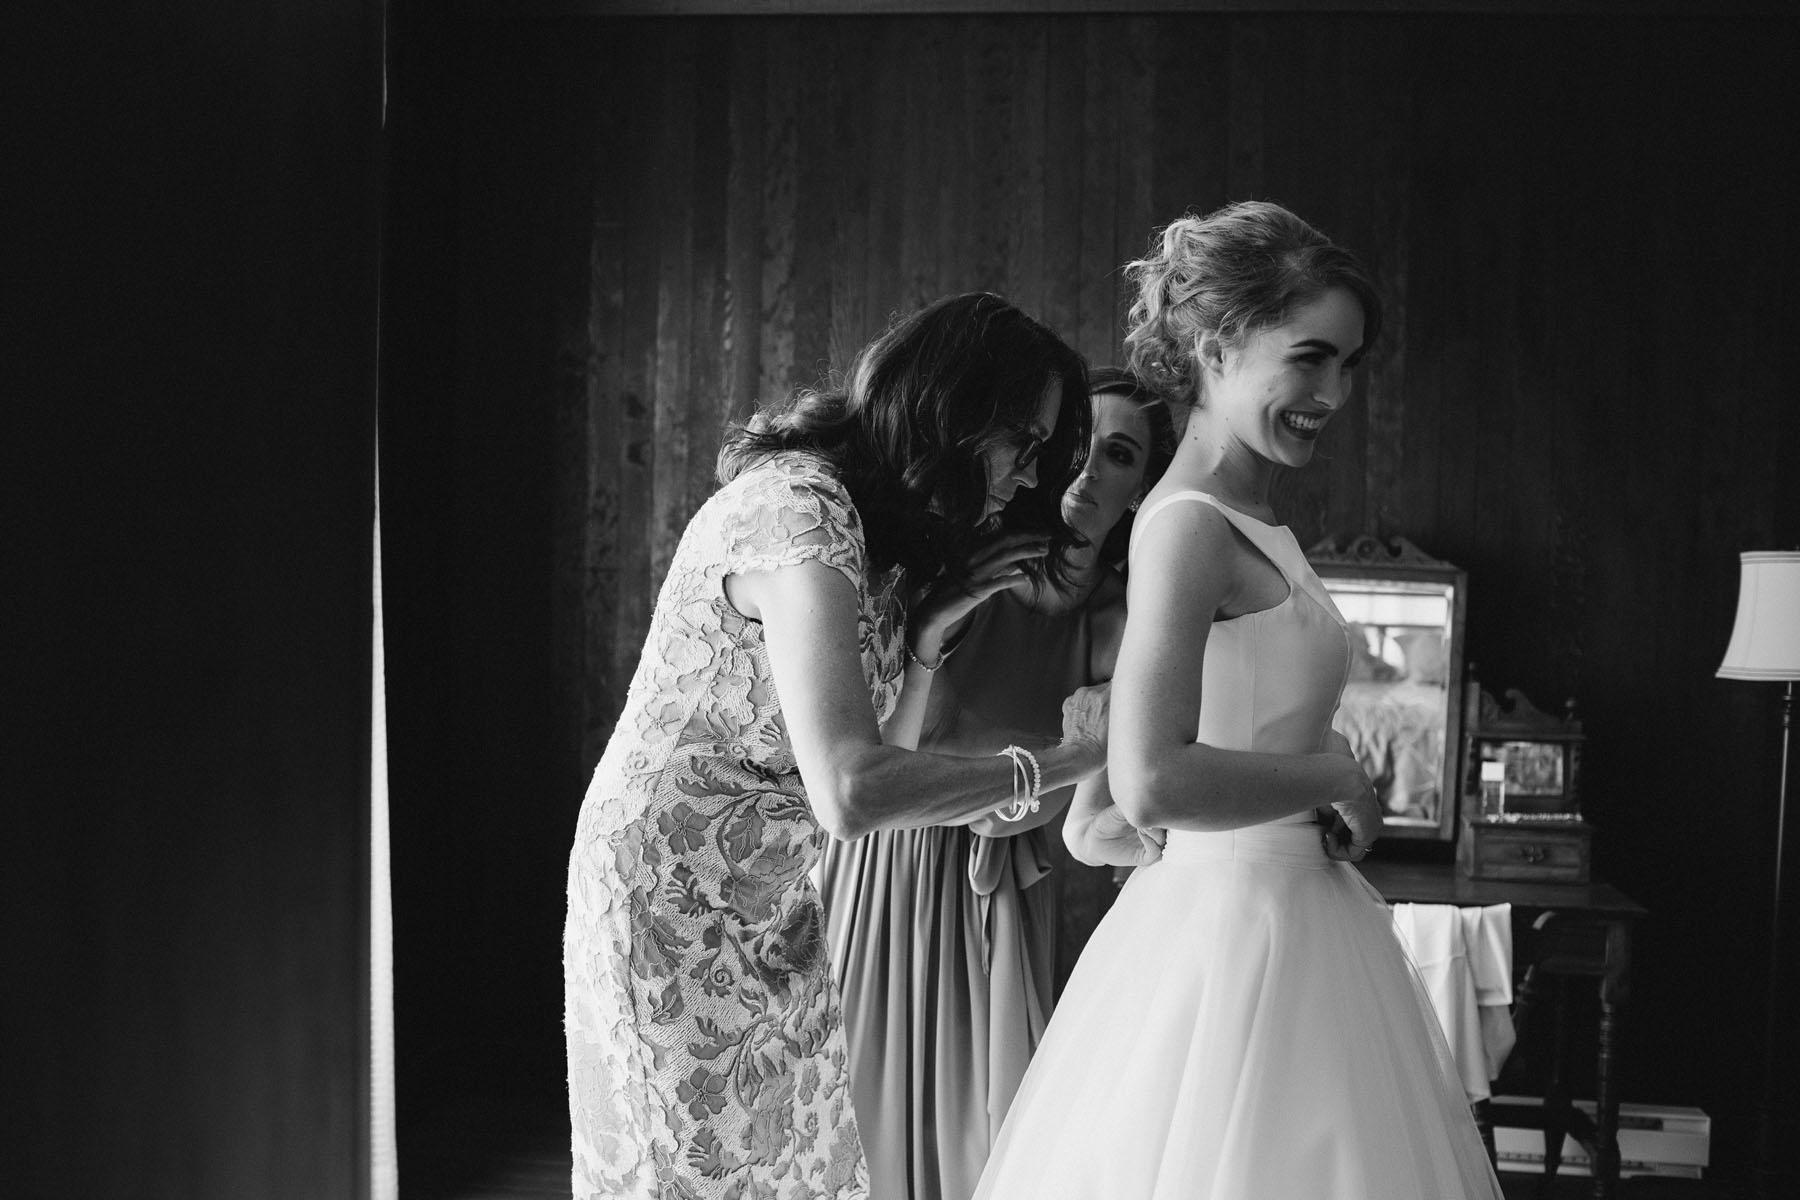 thetis-island-wedding-photographer-rp-rn-046.jpg